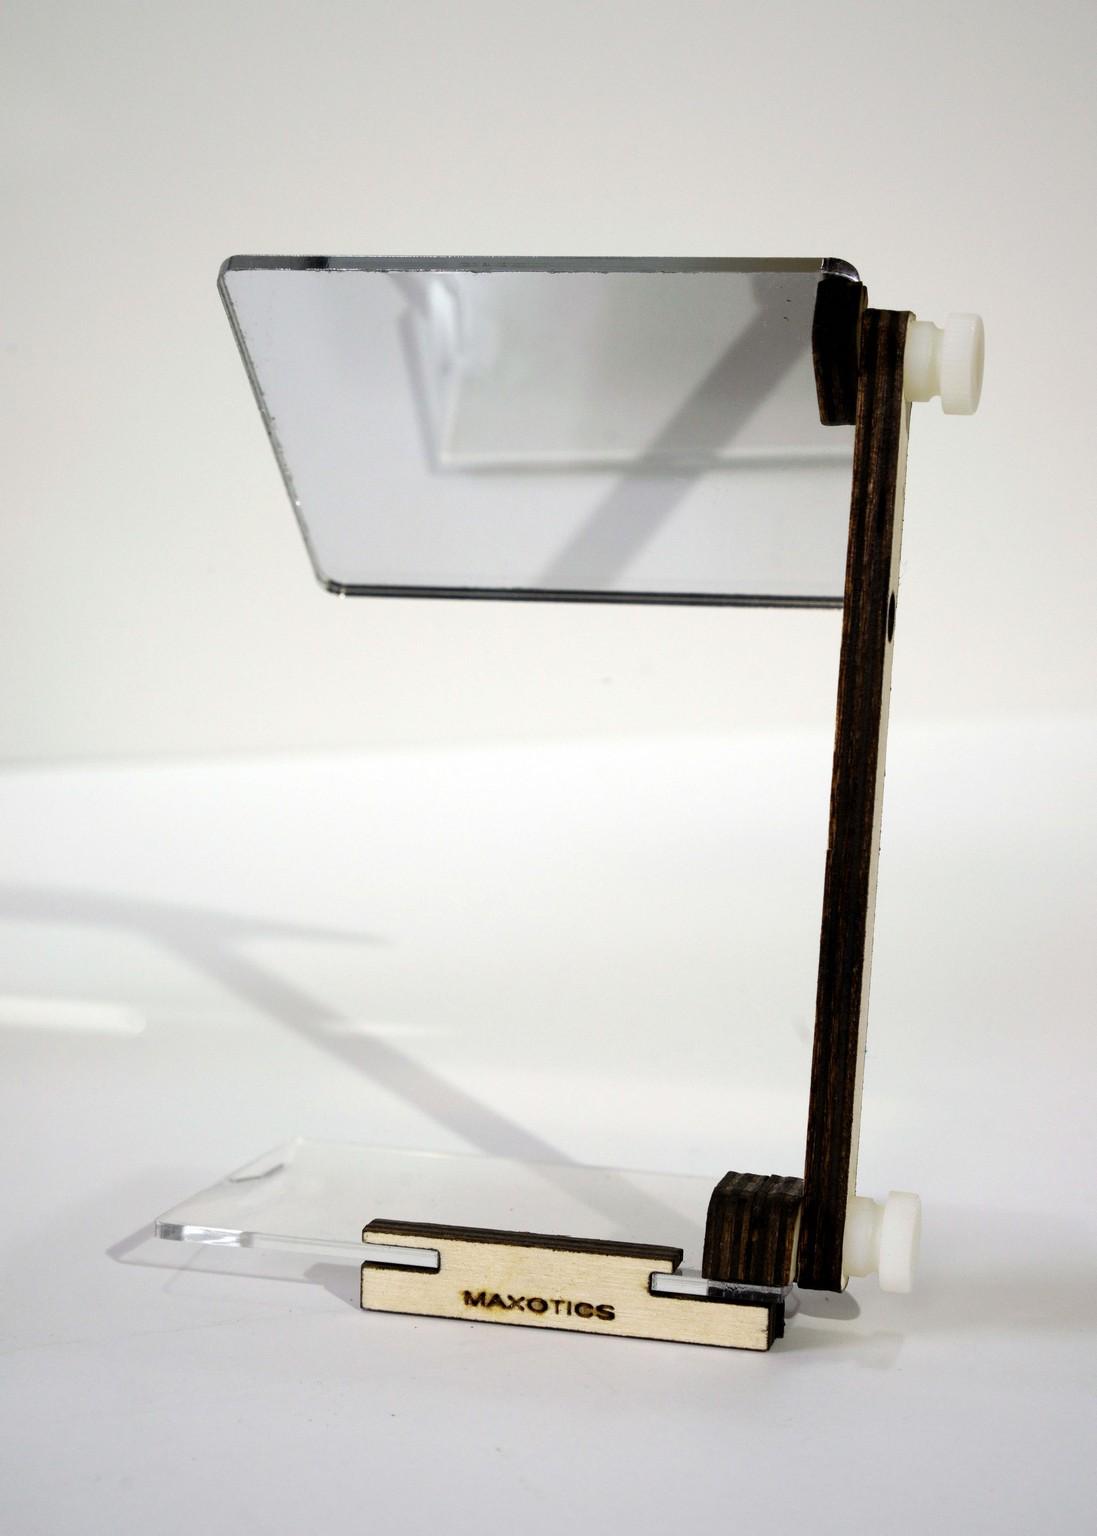 Vlogging Mirror For Tilt-Screen Cameras